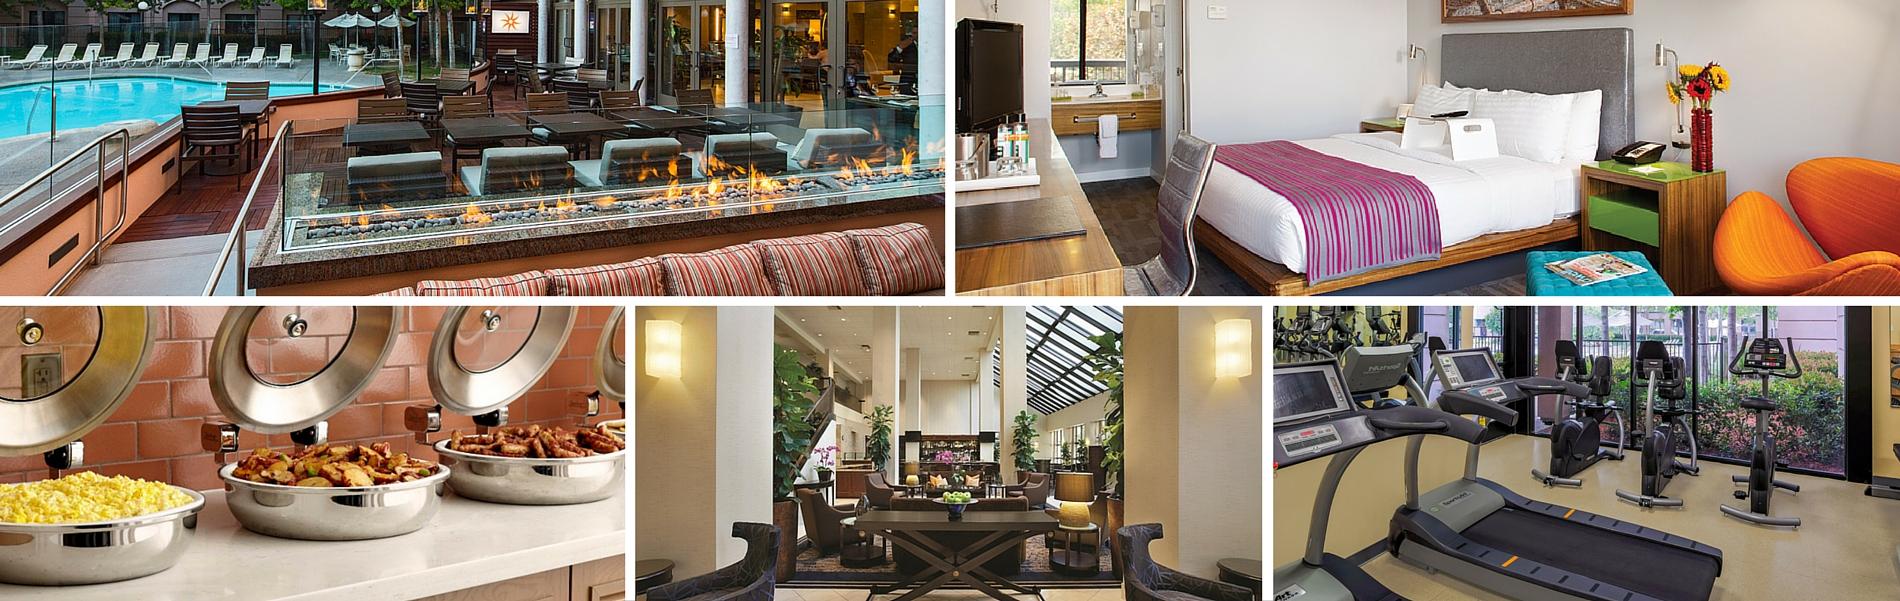 Santa Clara Hotels | Northern California Hotels | San Jose Hotels